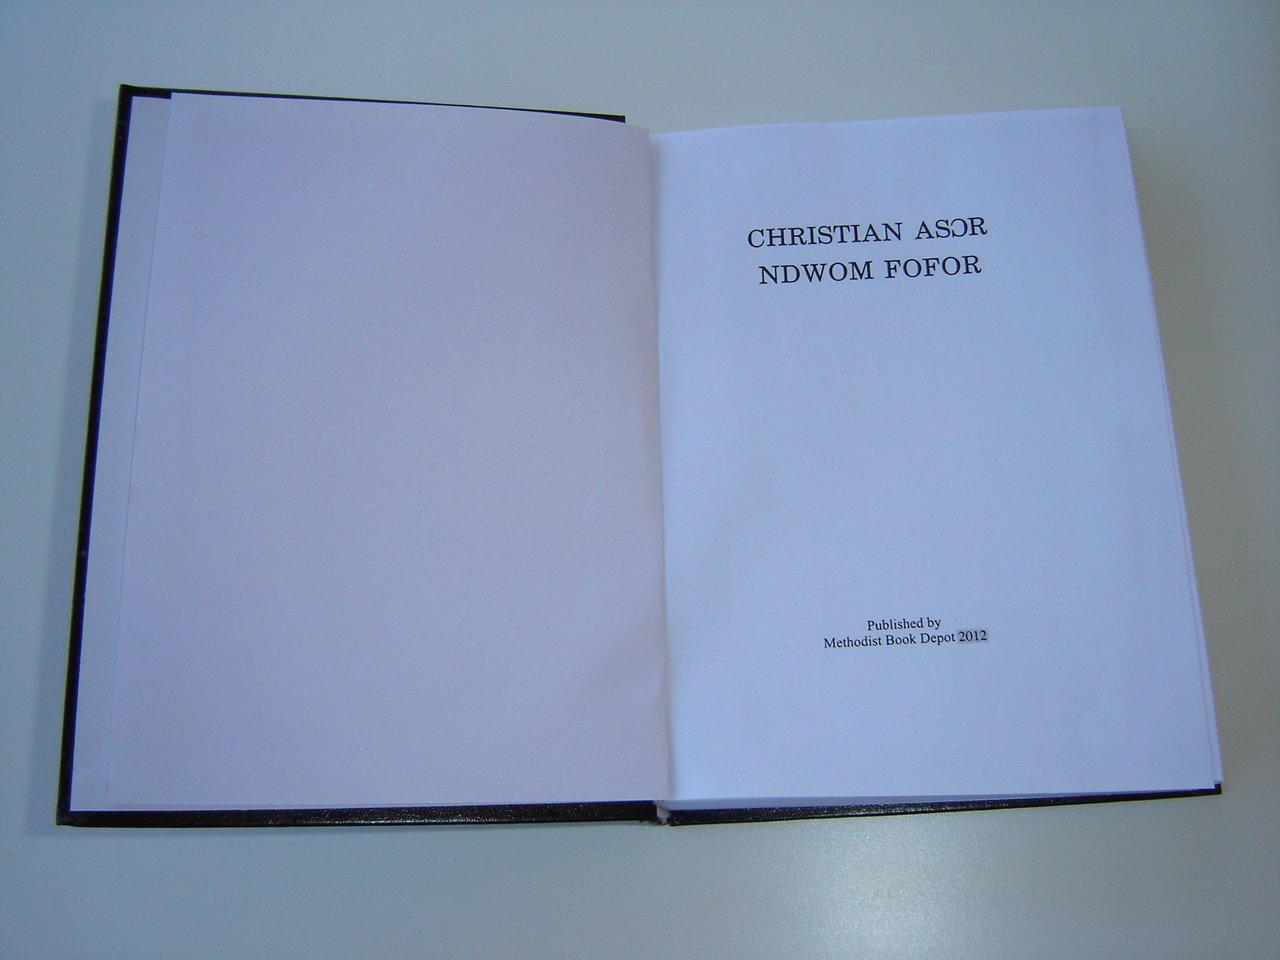 CHRISTIAN ASOR NDWOM FOFOR / Christian Hymnal with more than 1000